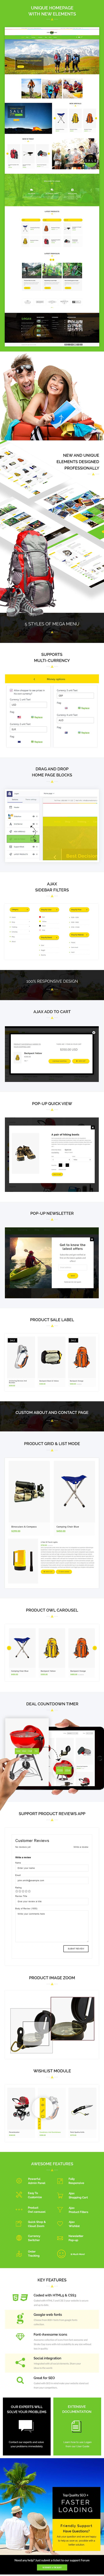 Logan - Travel, Adventure Store Shopify Theme - 1